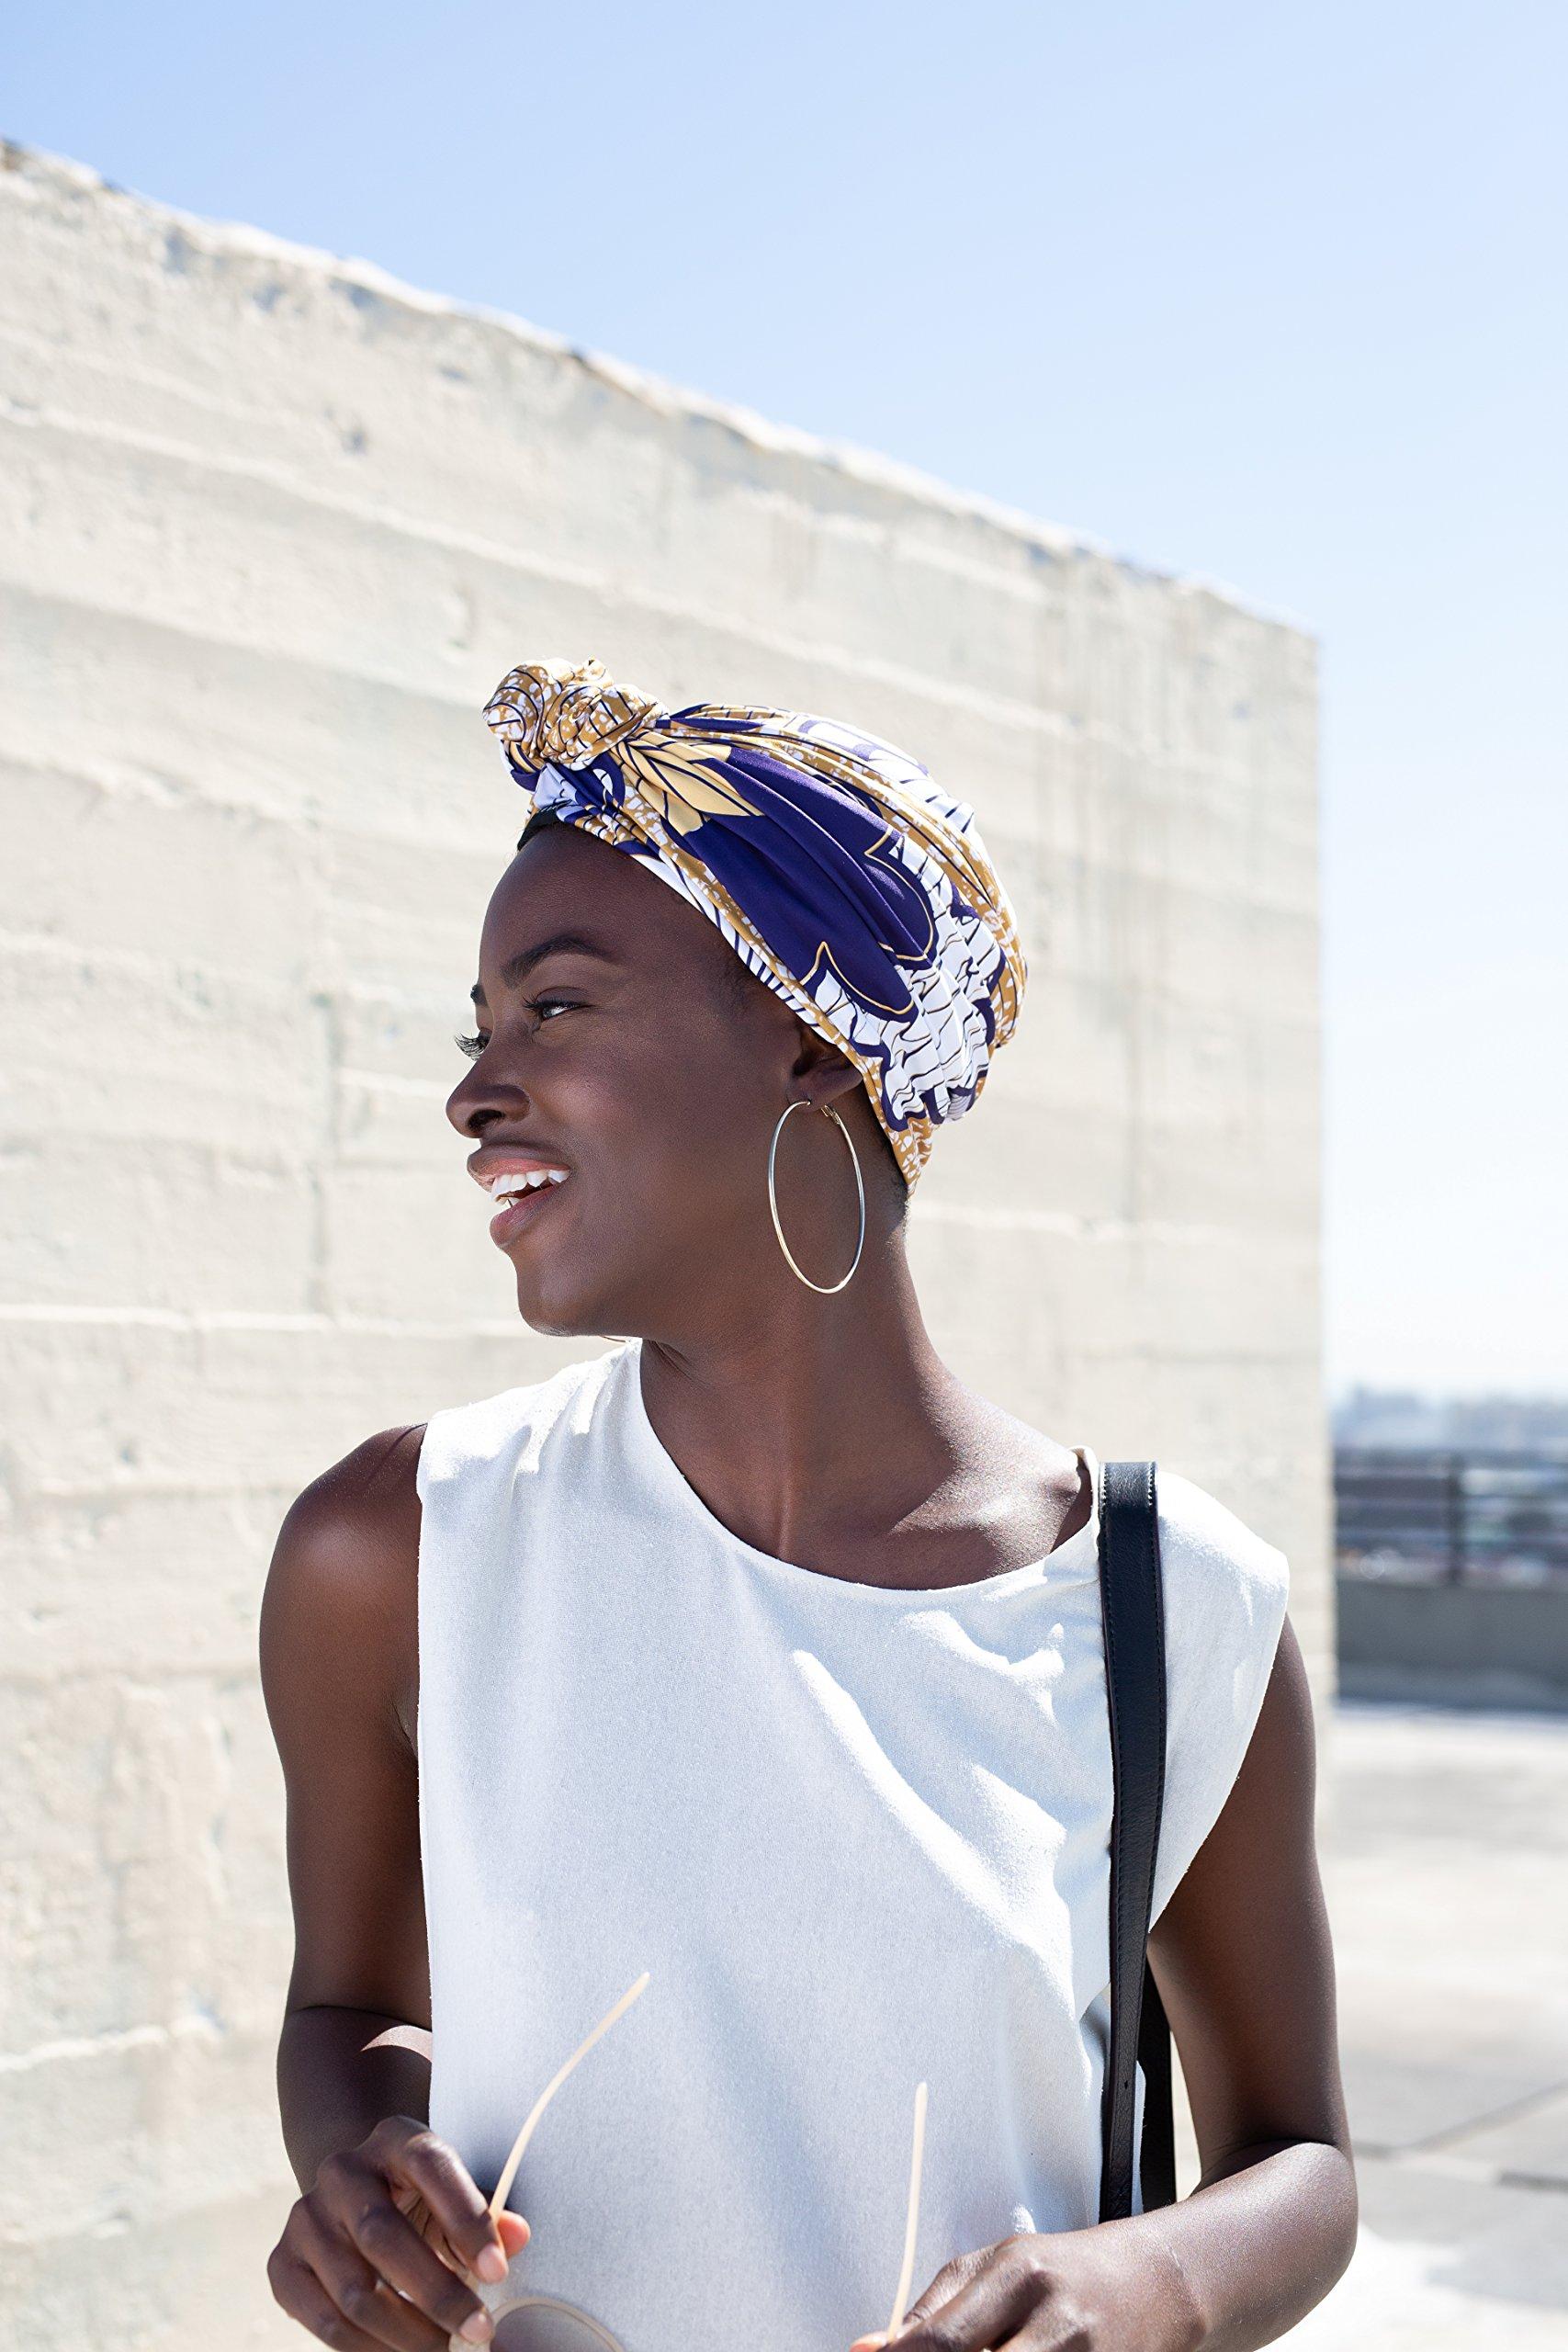 Grace Eleyae Knot Turban, Satin-Lined Hair Care Headwear [Day & Night] Malaika